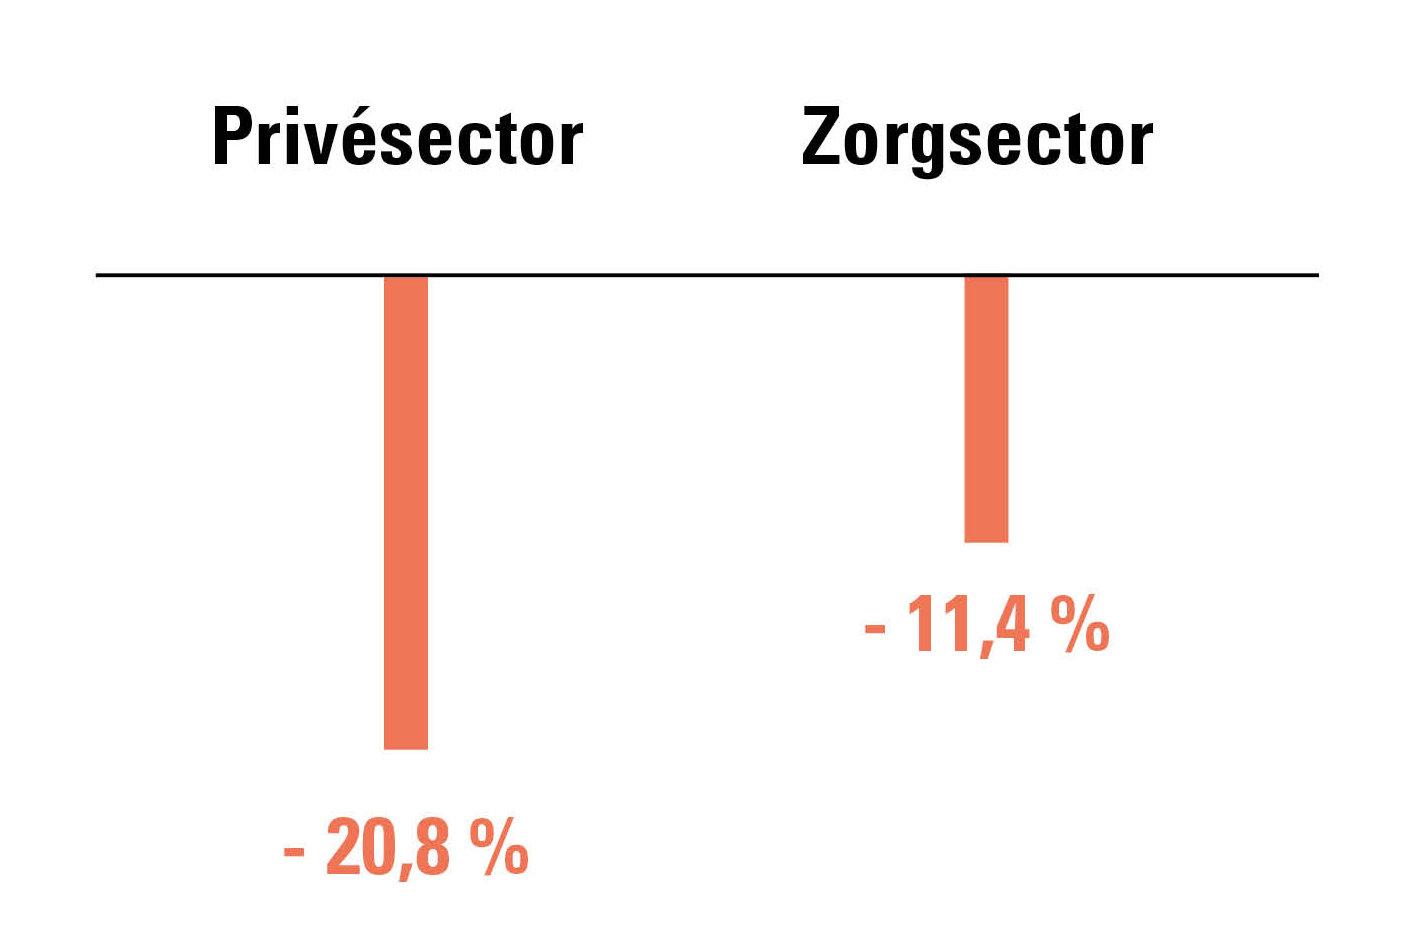 Instroom medewerkers in de zorgsector vs privésector, evolutie 2020 t.o.v. 2019